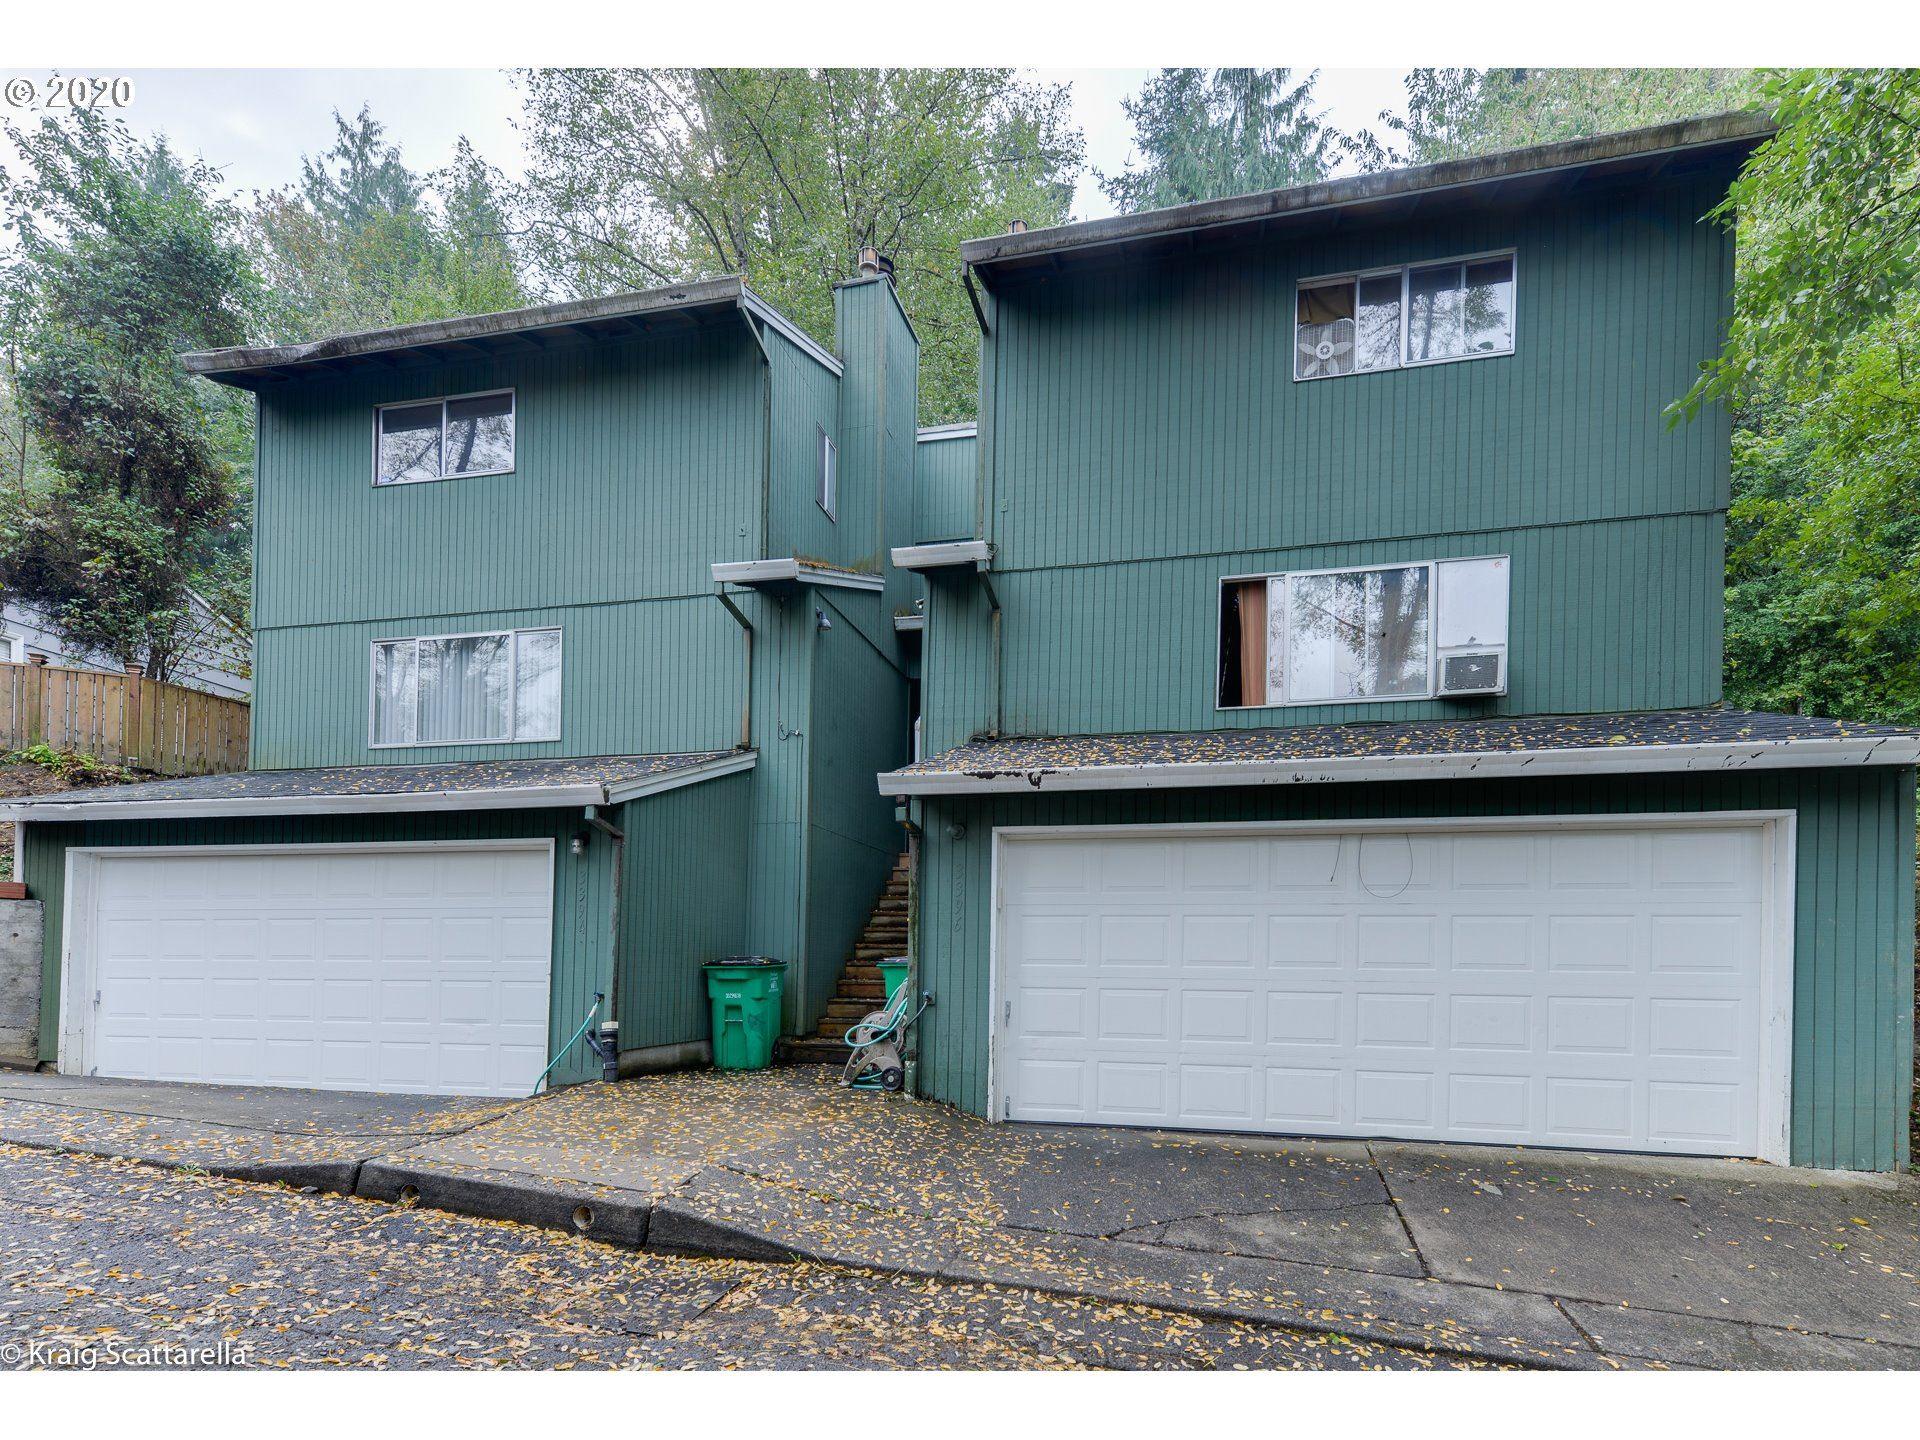 3394 SW BEAVERTON HILLSDALE HWY, Portland, OR 97239 - MLS#: 20535399